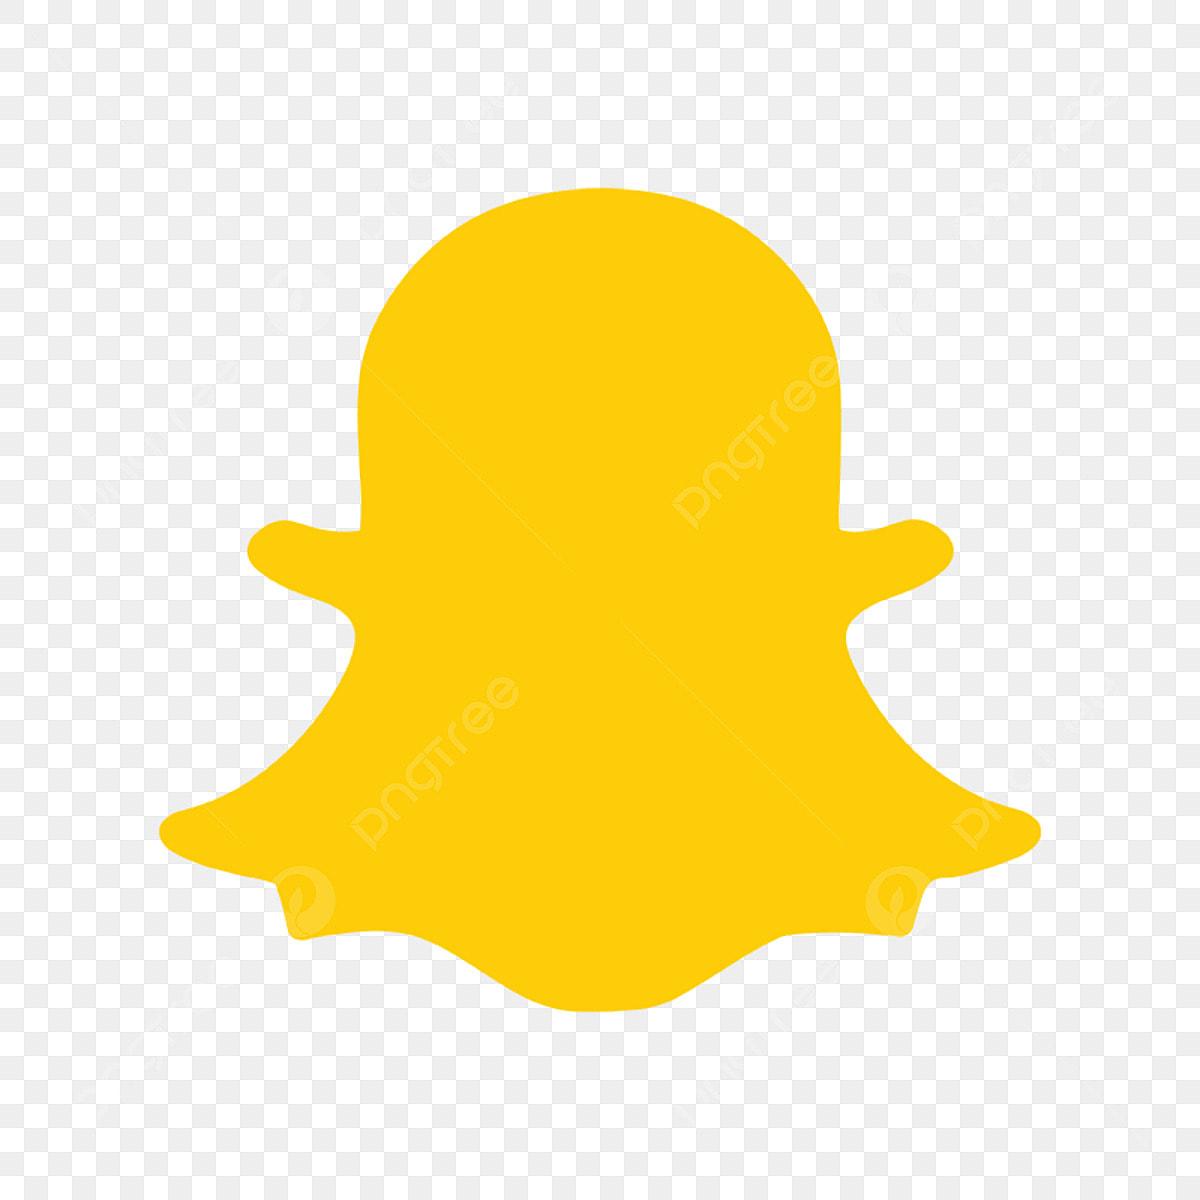 Snapchat أيقونة Snapchat الشعار اجتماعي وسائل الإعلام أيقونة Png والمتجهات للتحميل مجانا